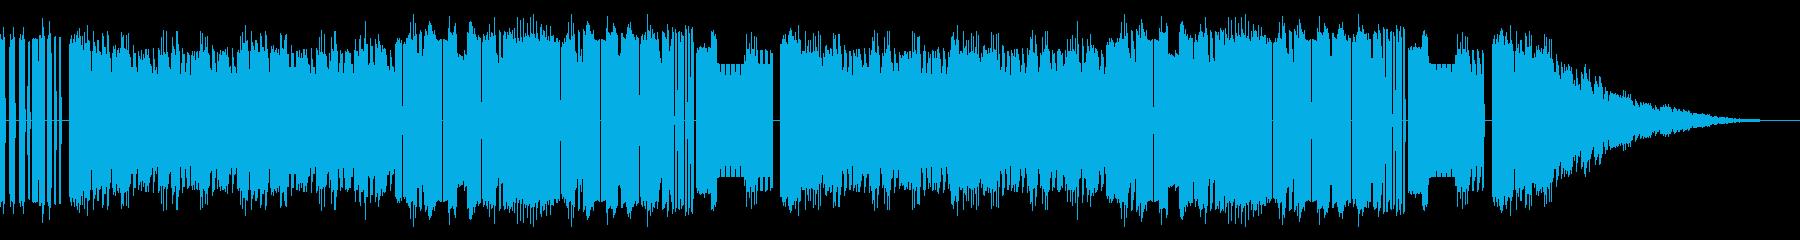 FC風コミカルなオープニングの再生済みの波形